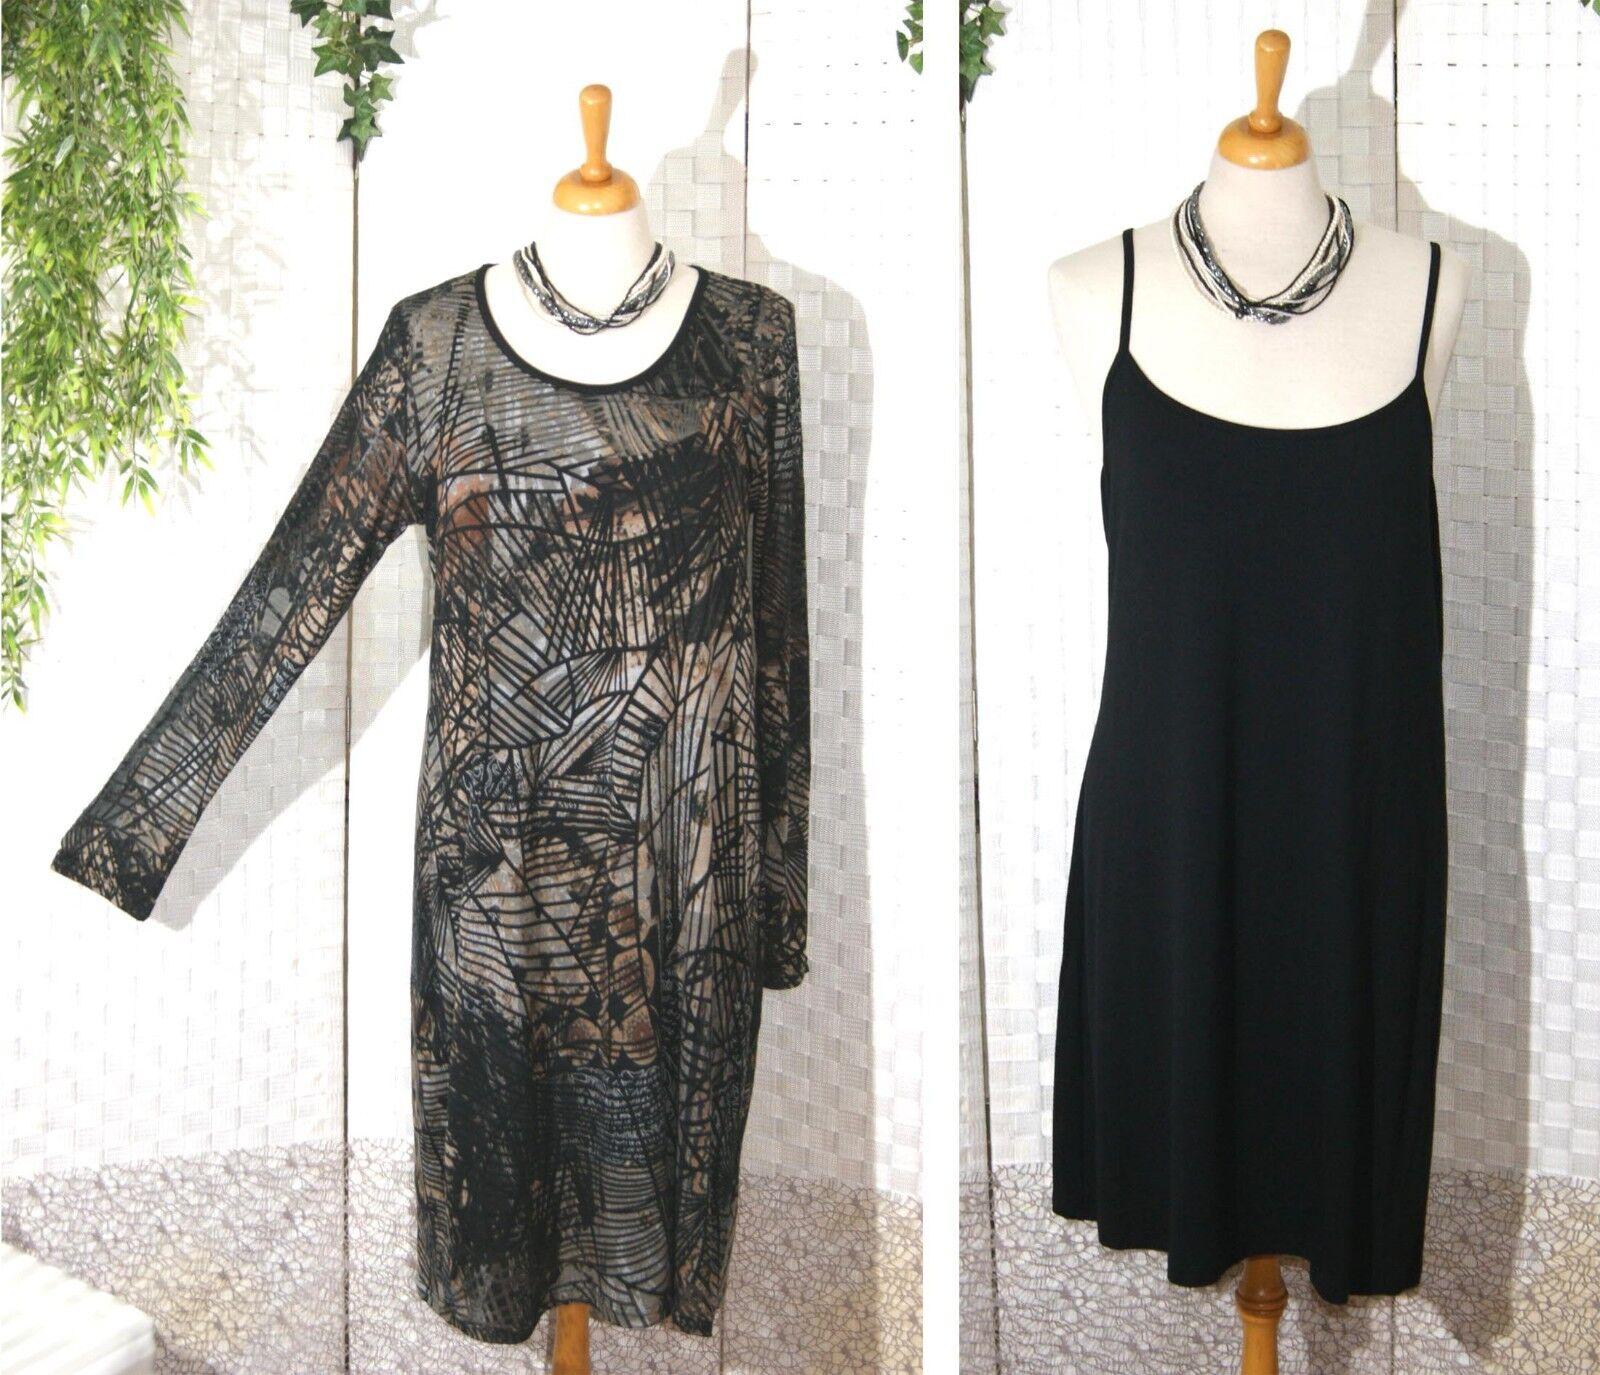 OPHILIA Kleid braun + OPHILIA Lang Top schwarz Gr. 1 38 40 42 Ausbrenner 2 Teile